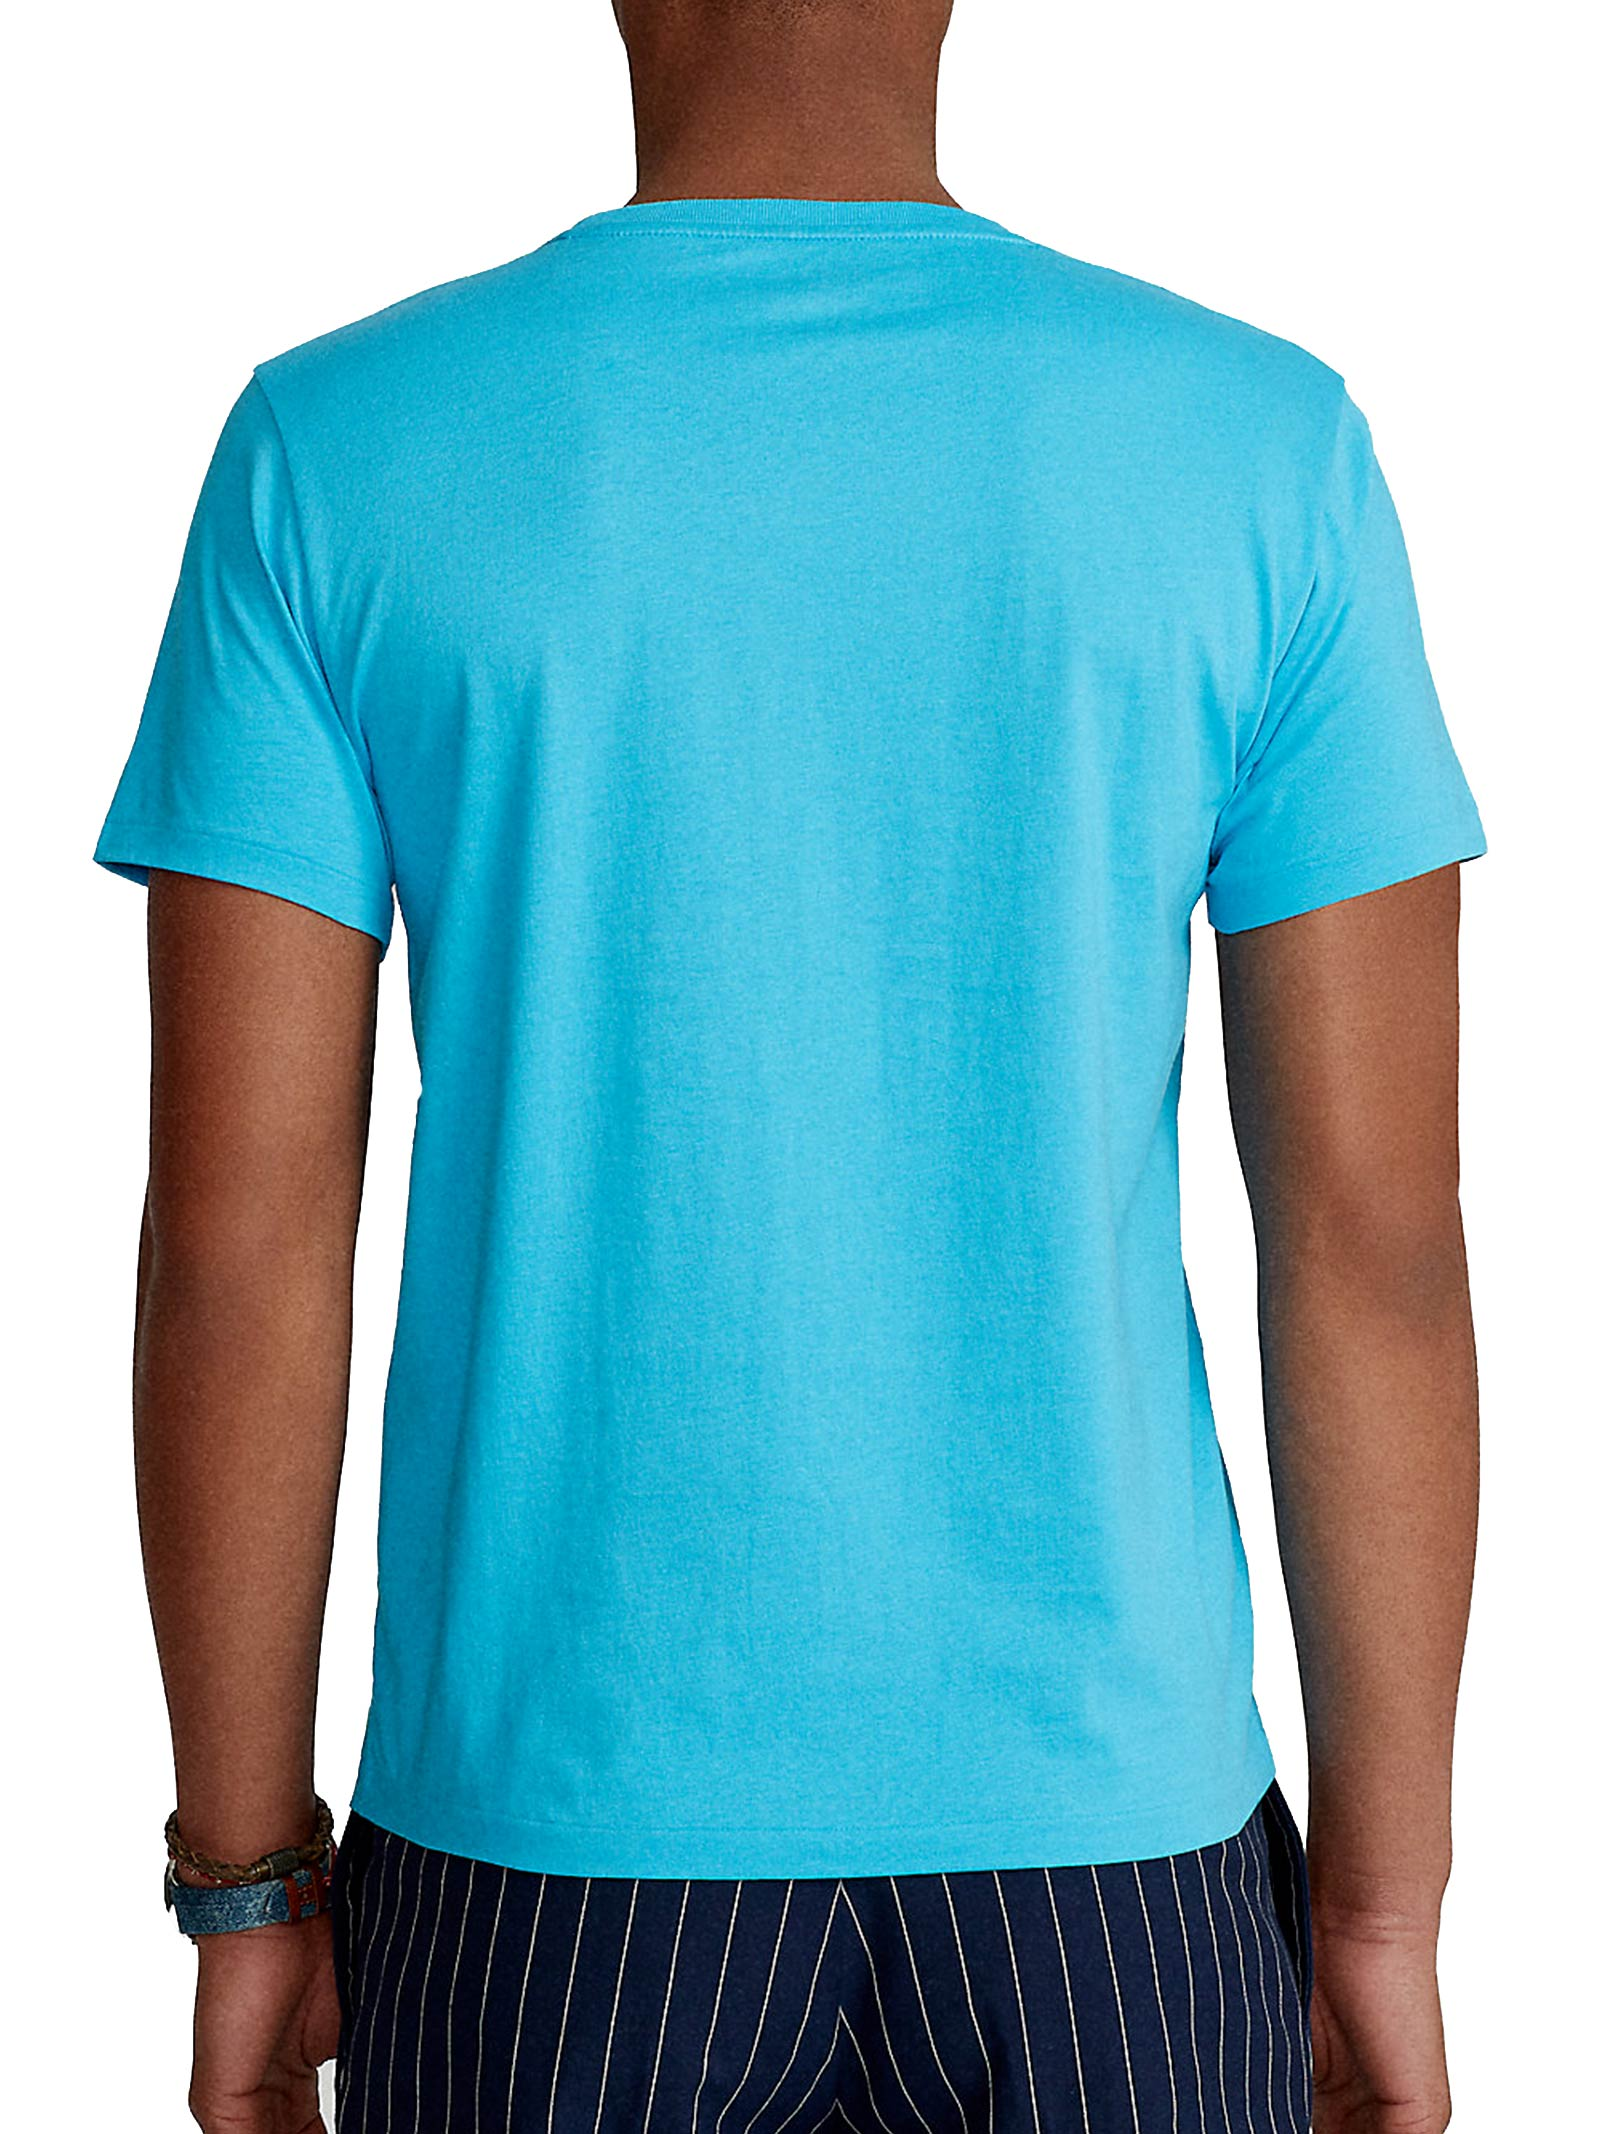 T-shirt celeste girocollo slimfit RALPH LAUREN | T-shirt | 710-671438217